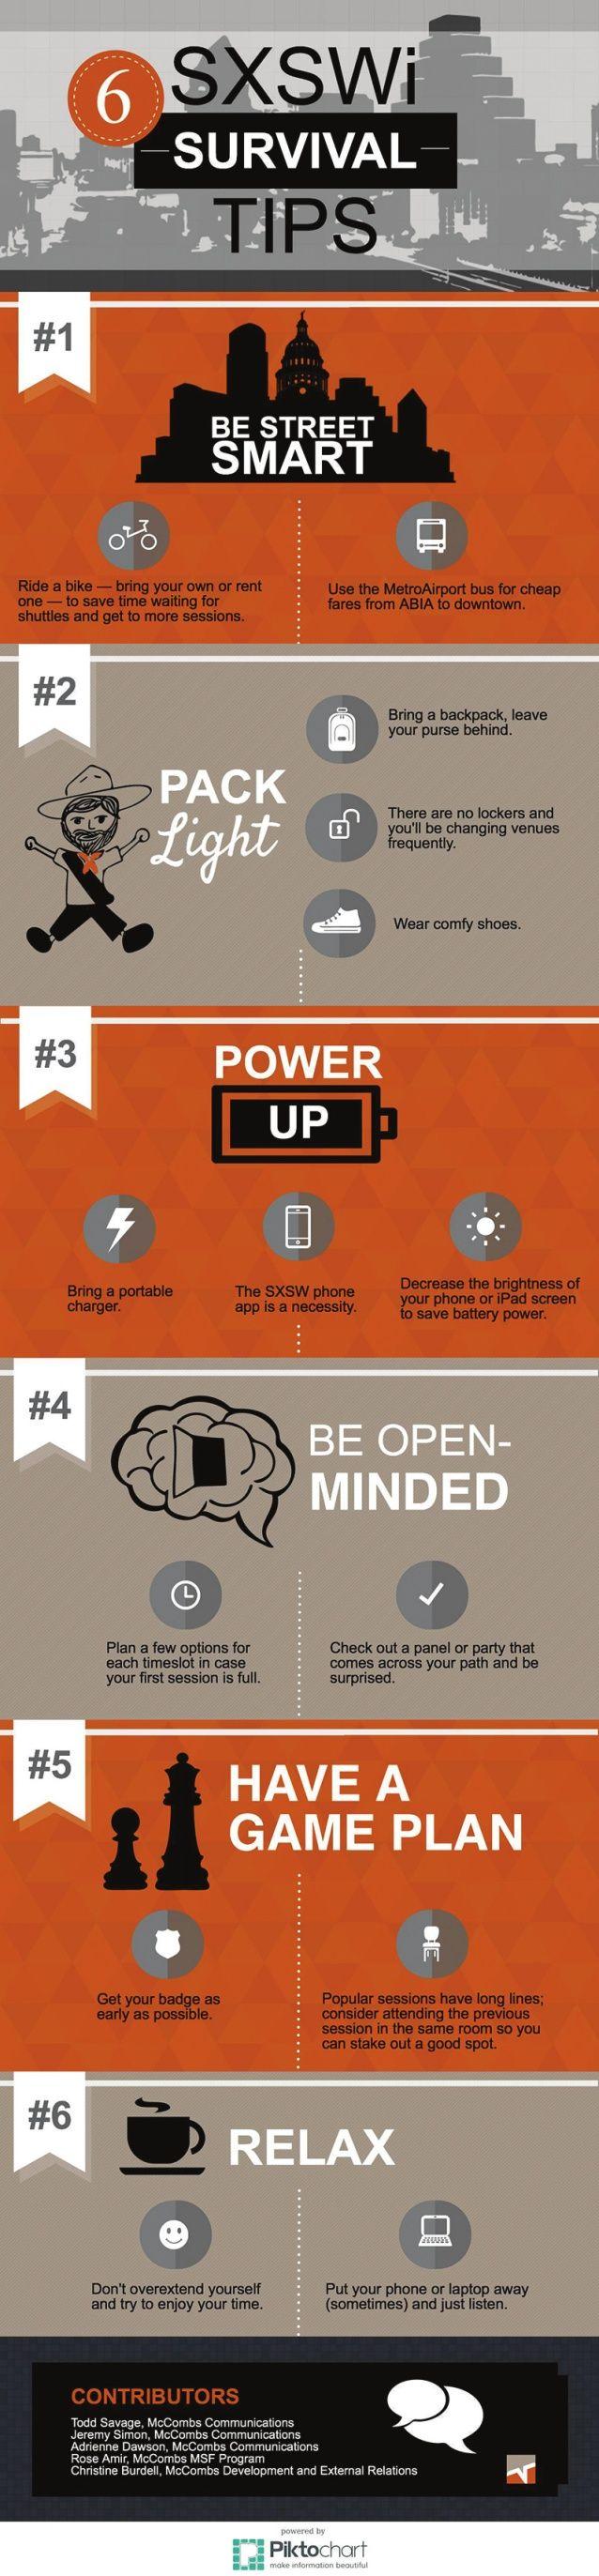 How to Survive SXSW Interactive (Infographic)